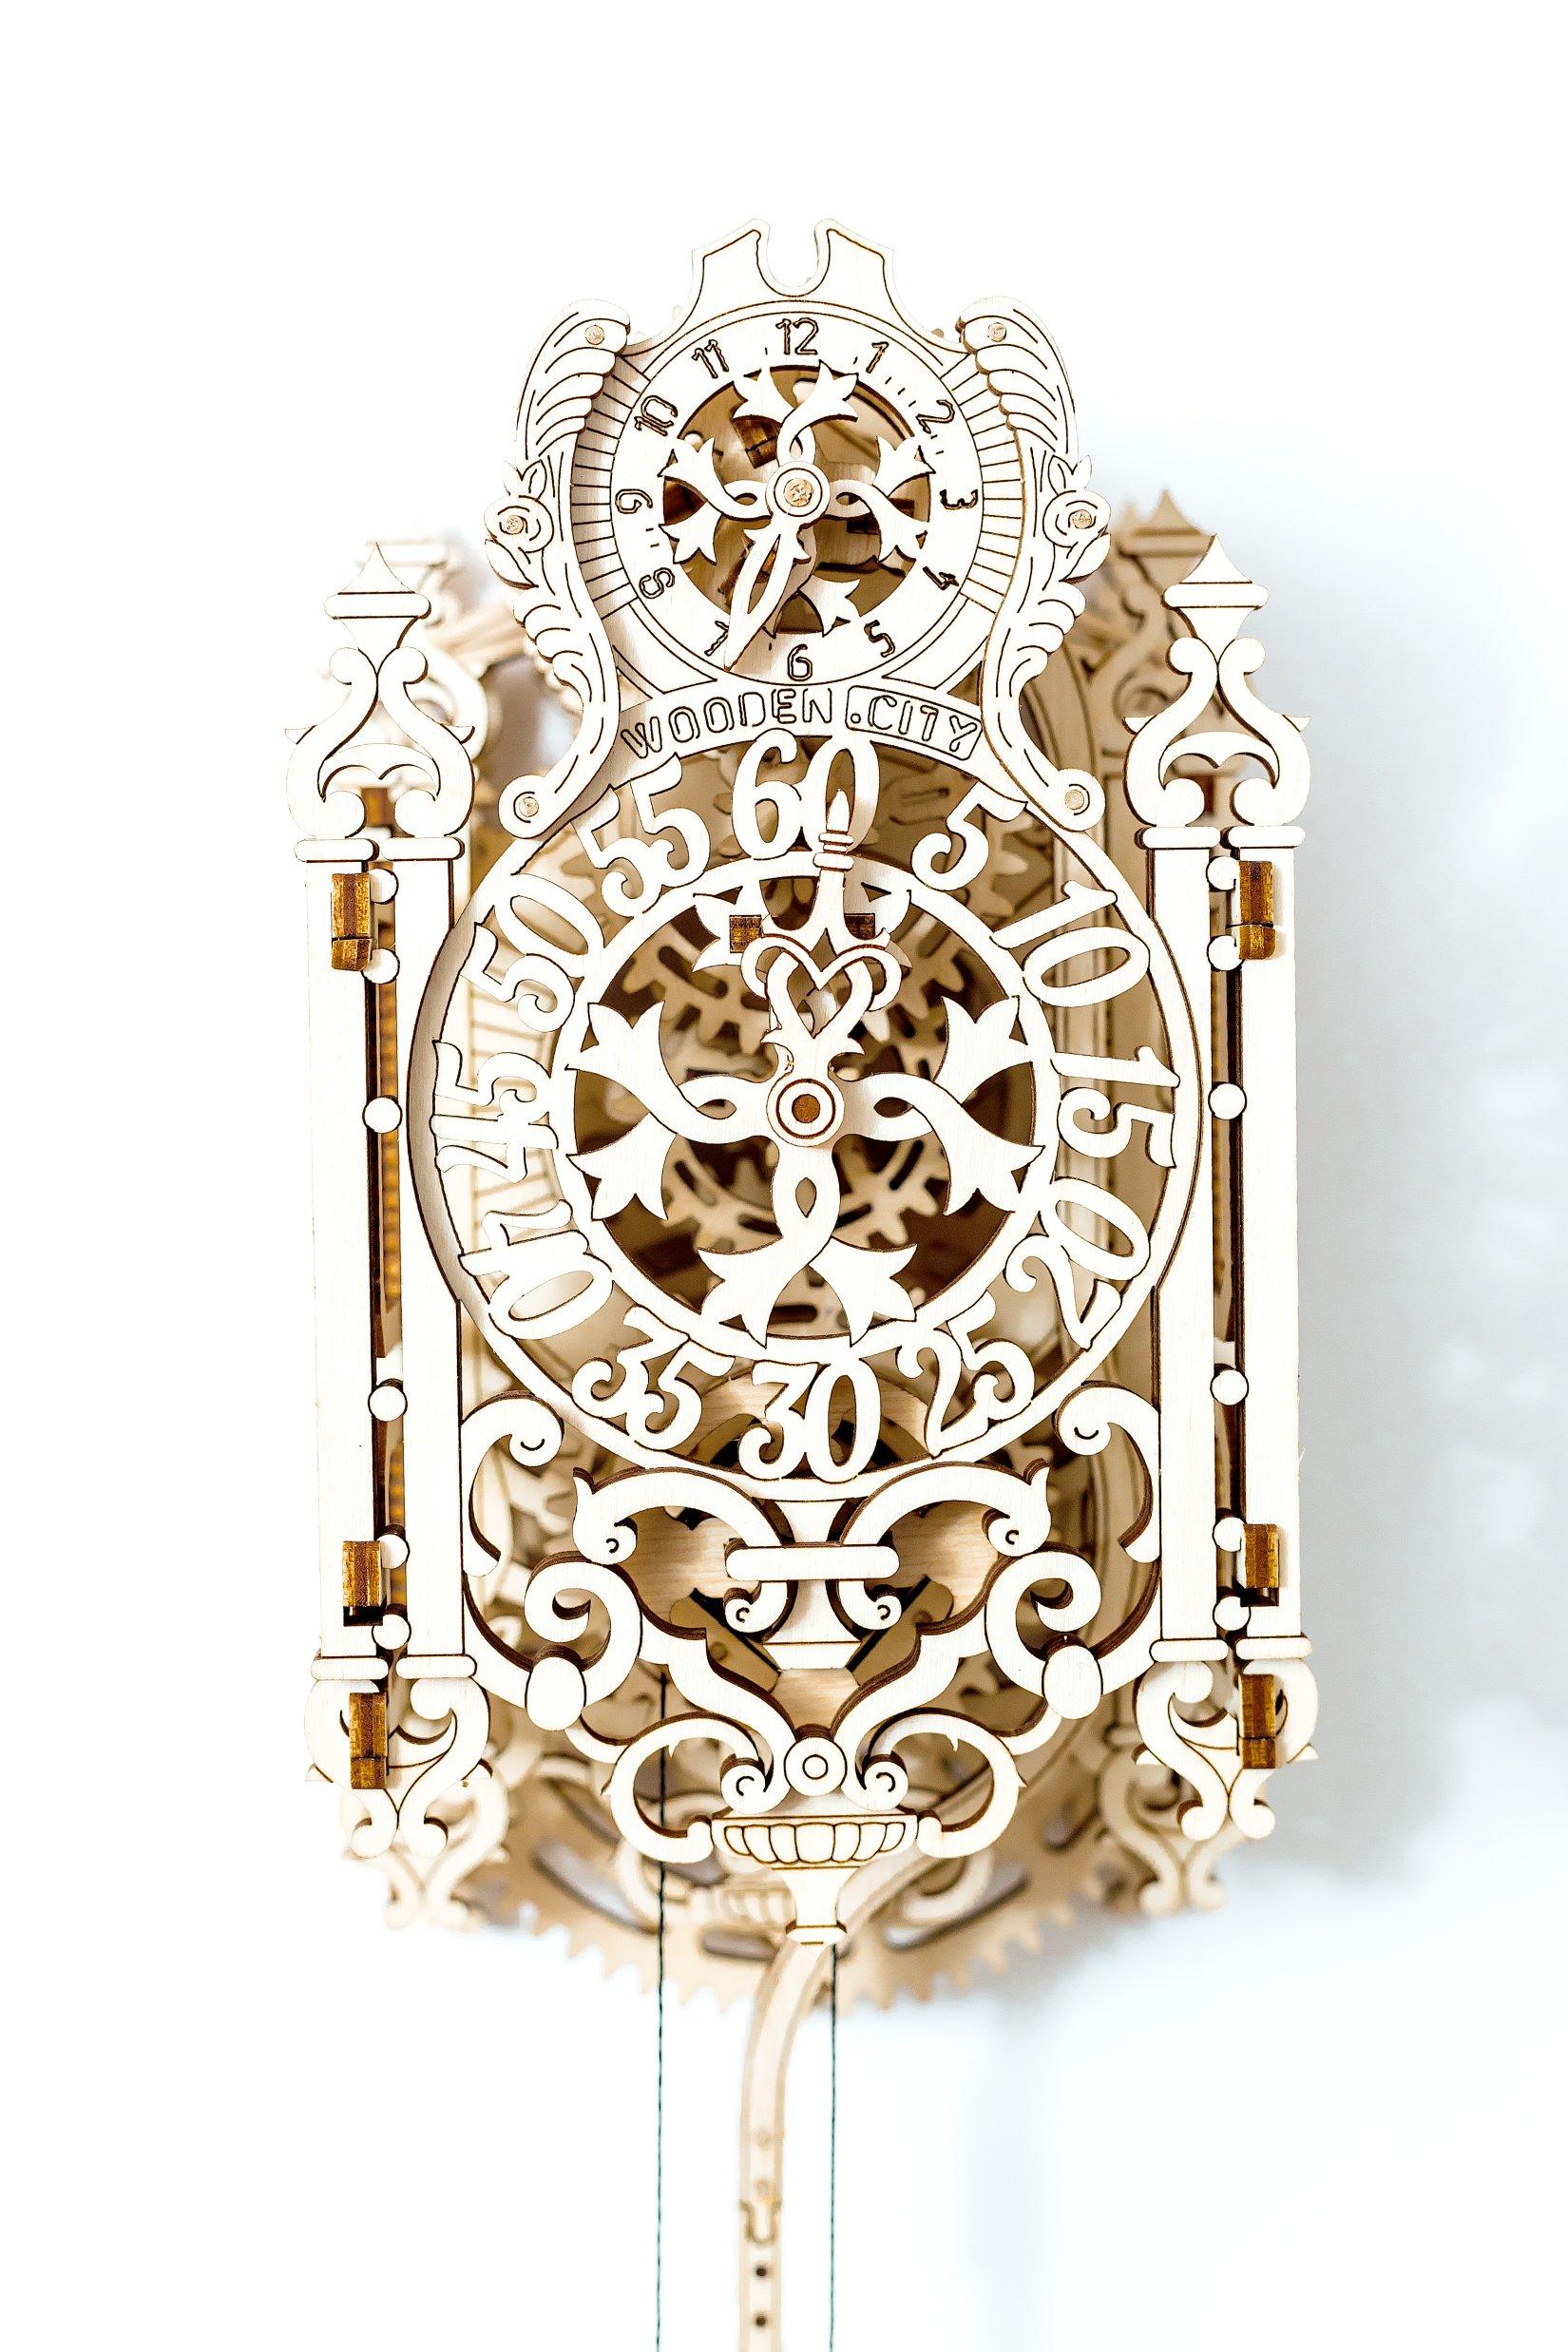 WOODEN CITY Royal Clock, 156 pieces